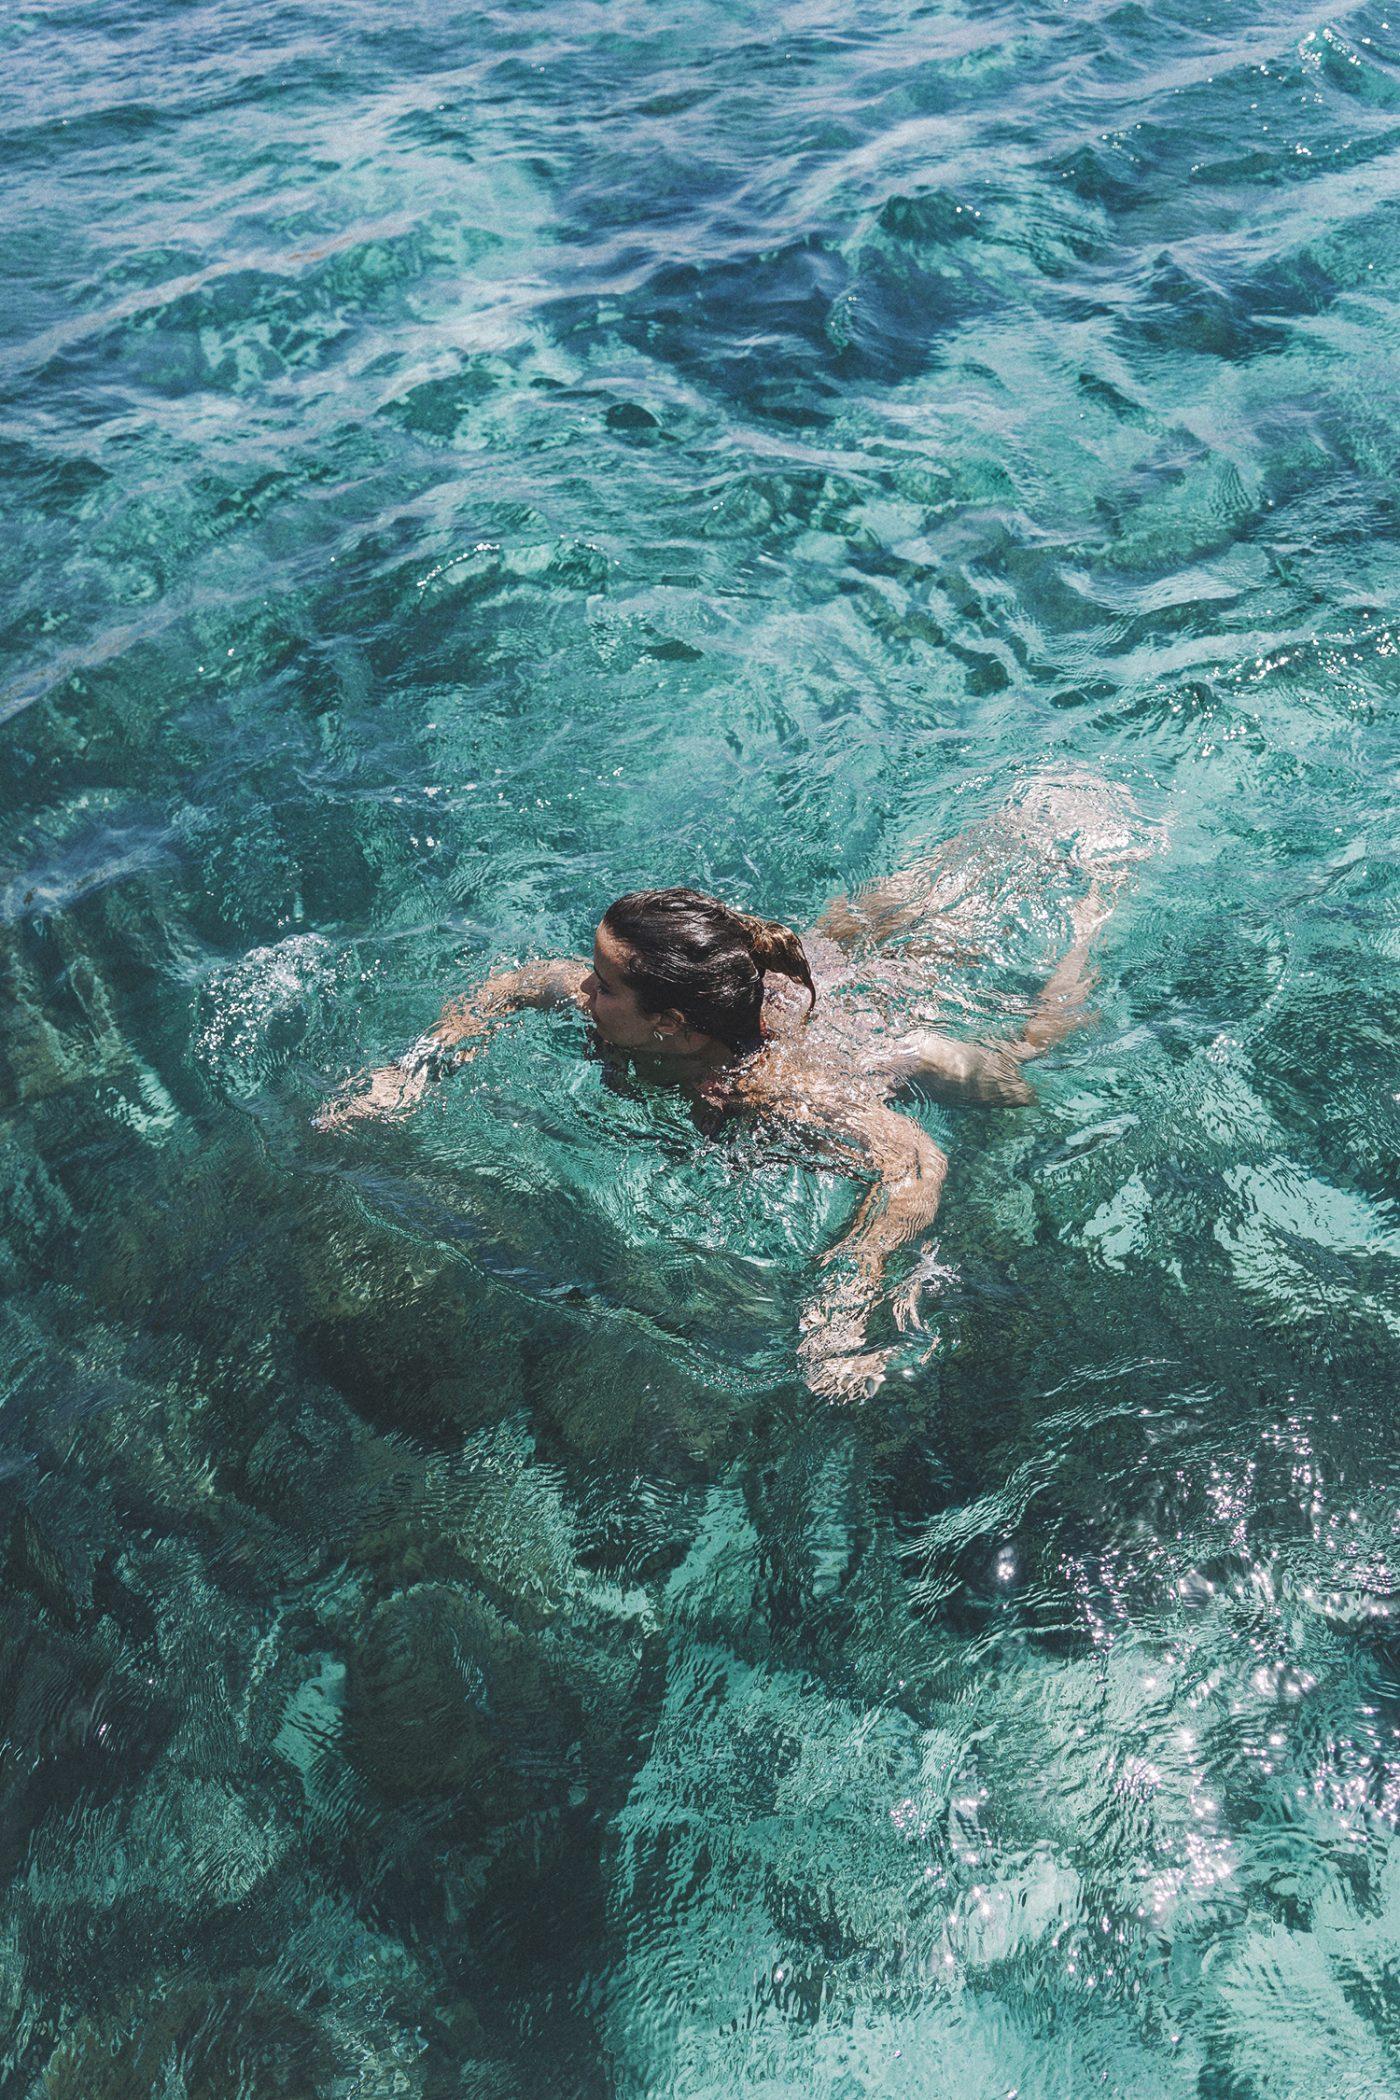 Mykonos-Beach-Summer-BeachWear-Bikini-For_Love_And_Lemons-Collage_Vintage-138